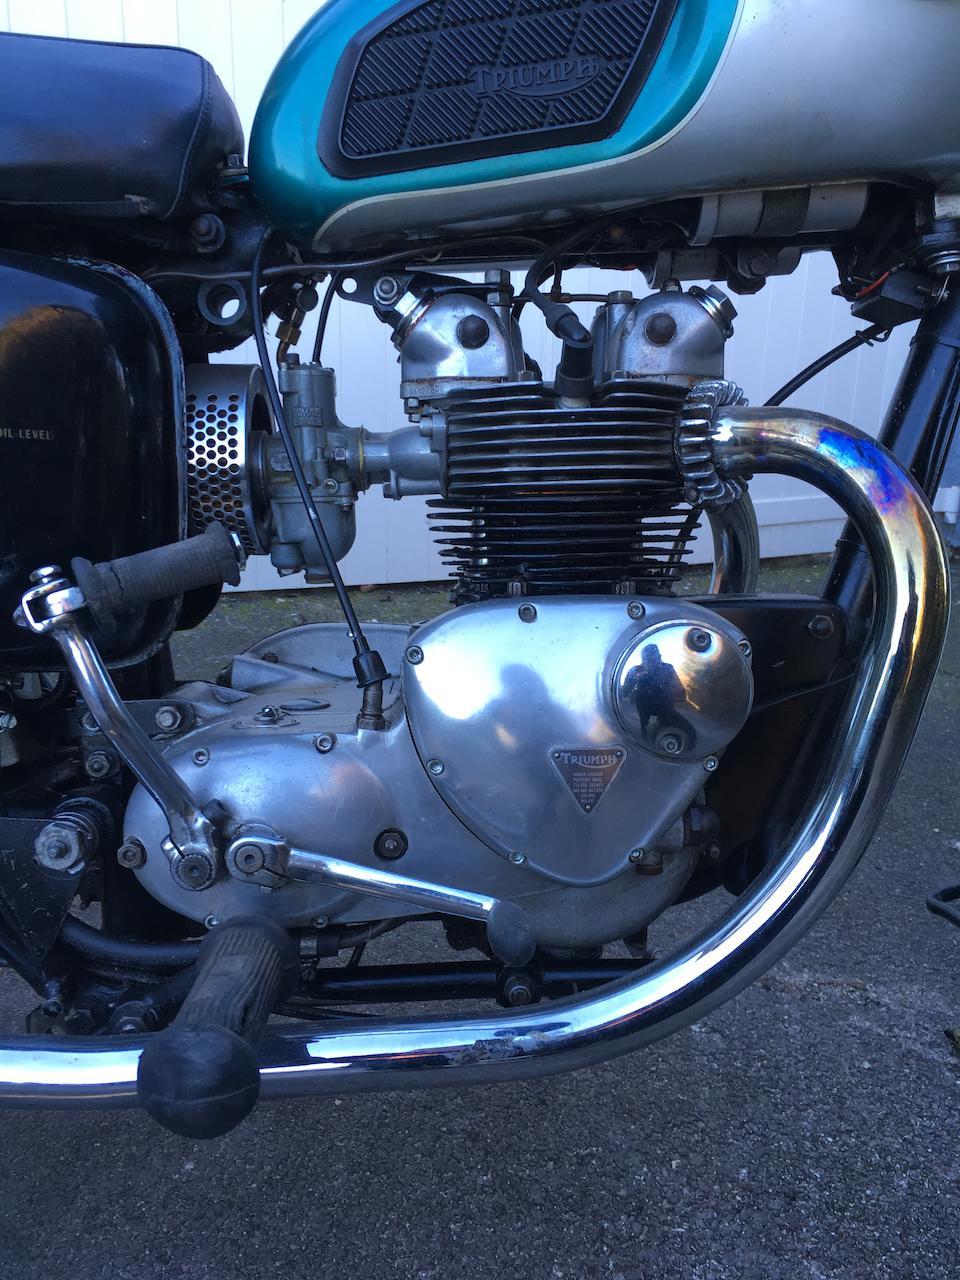 1968 Triumph 490cc Daytona Frame no. T100T H64801 Engine no. T100T H64801